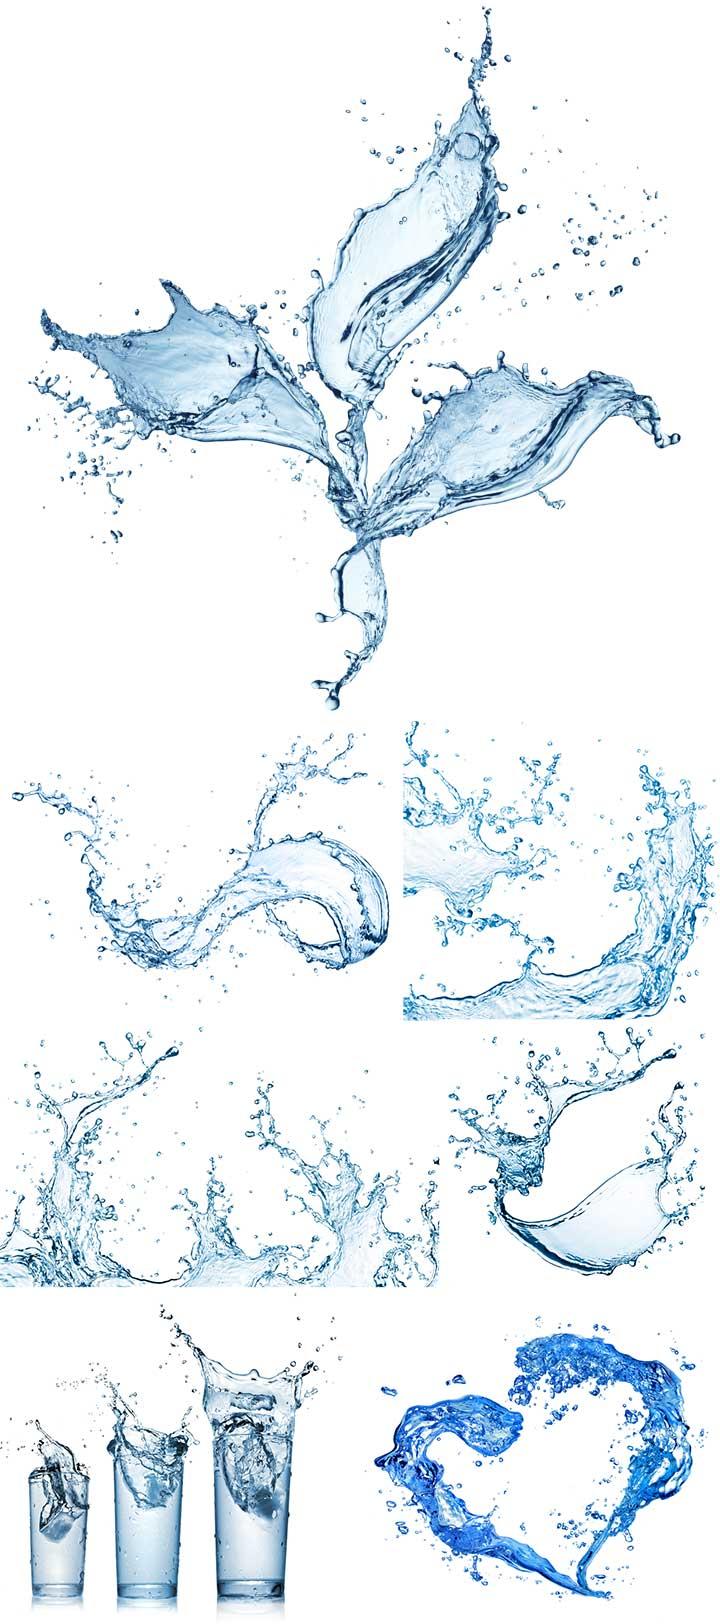 Рисуем воду в фотошоп